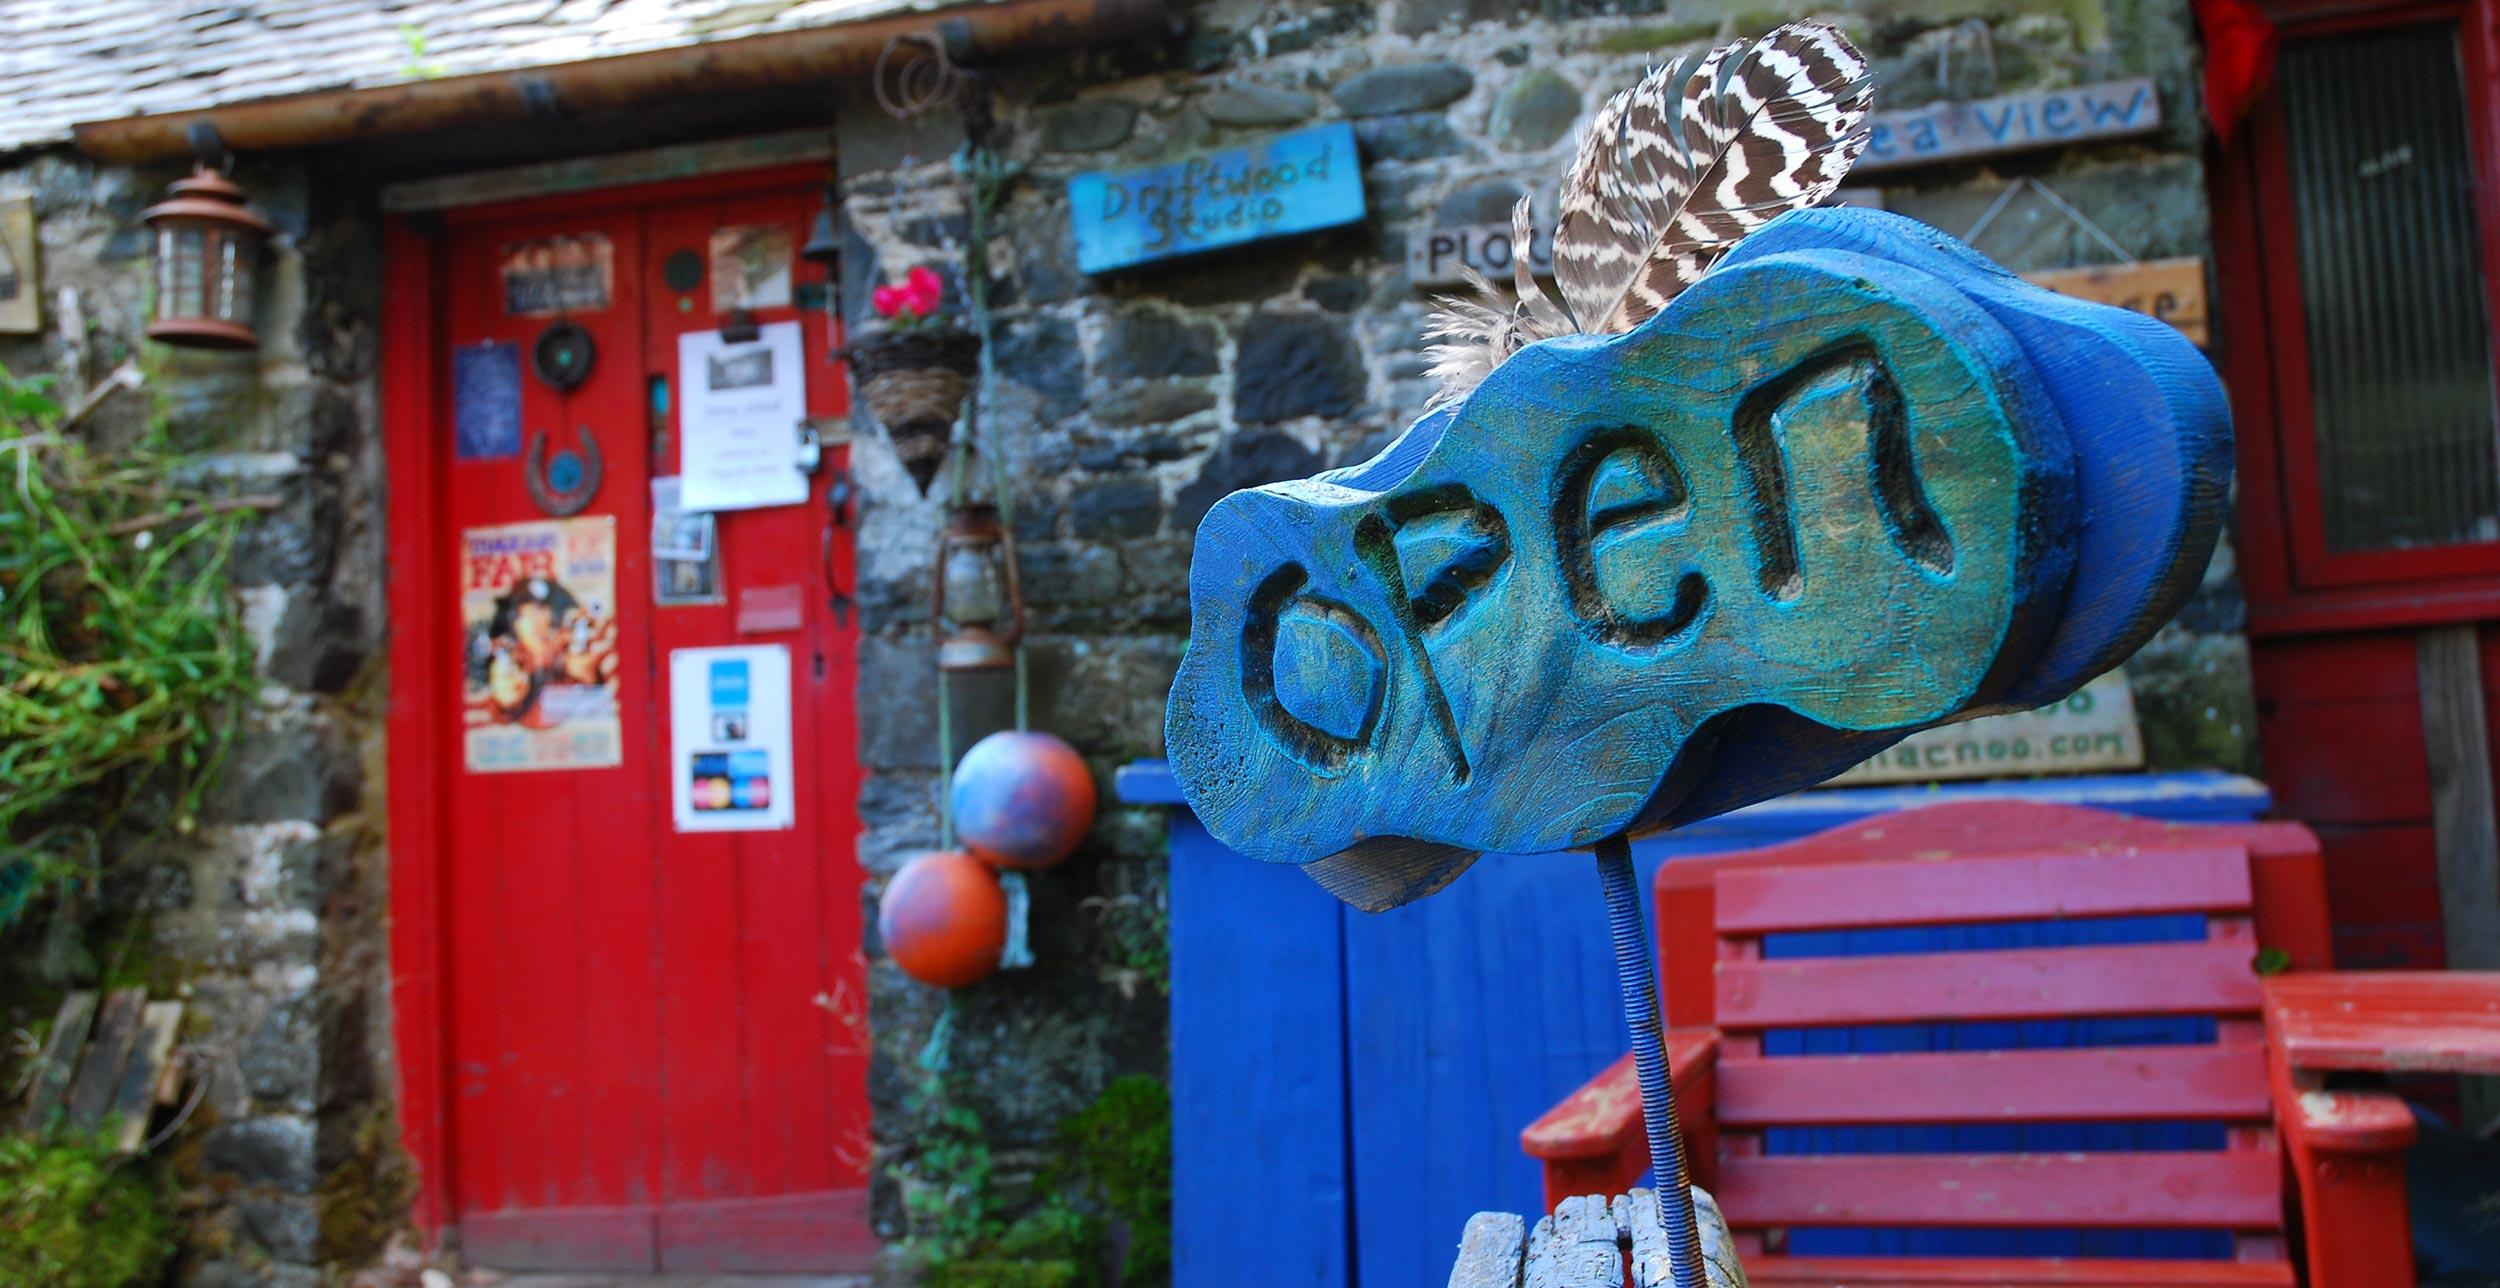 56.-Craft-workshops,-Traquair-House.jpg